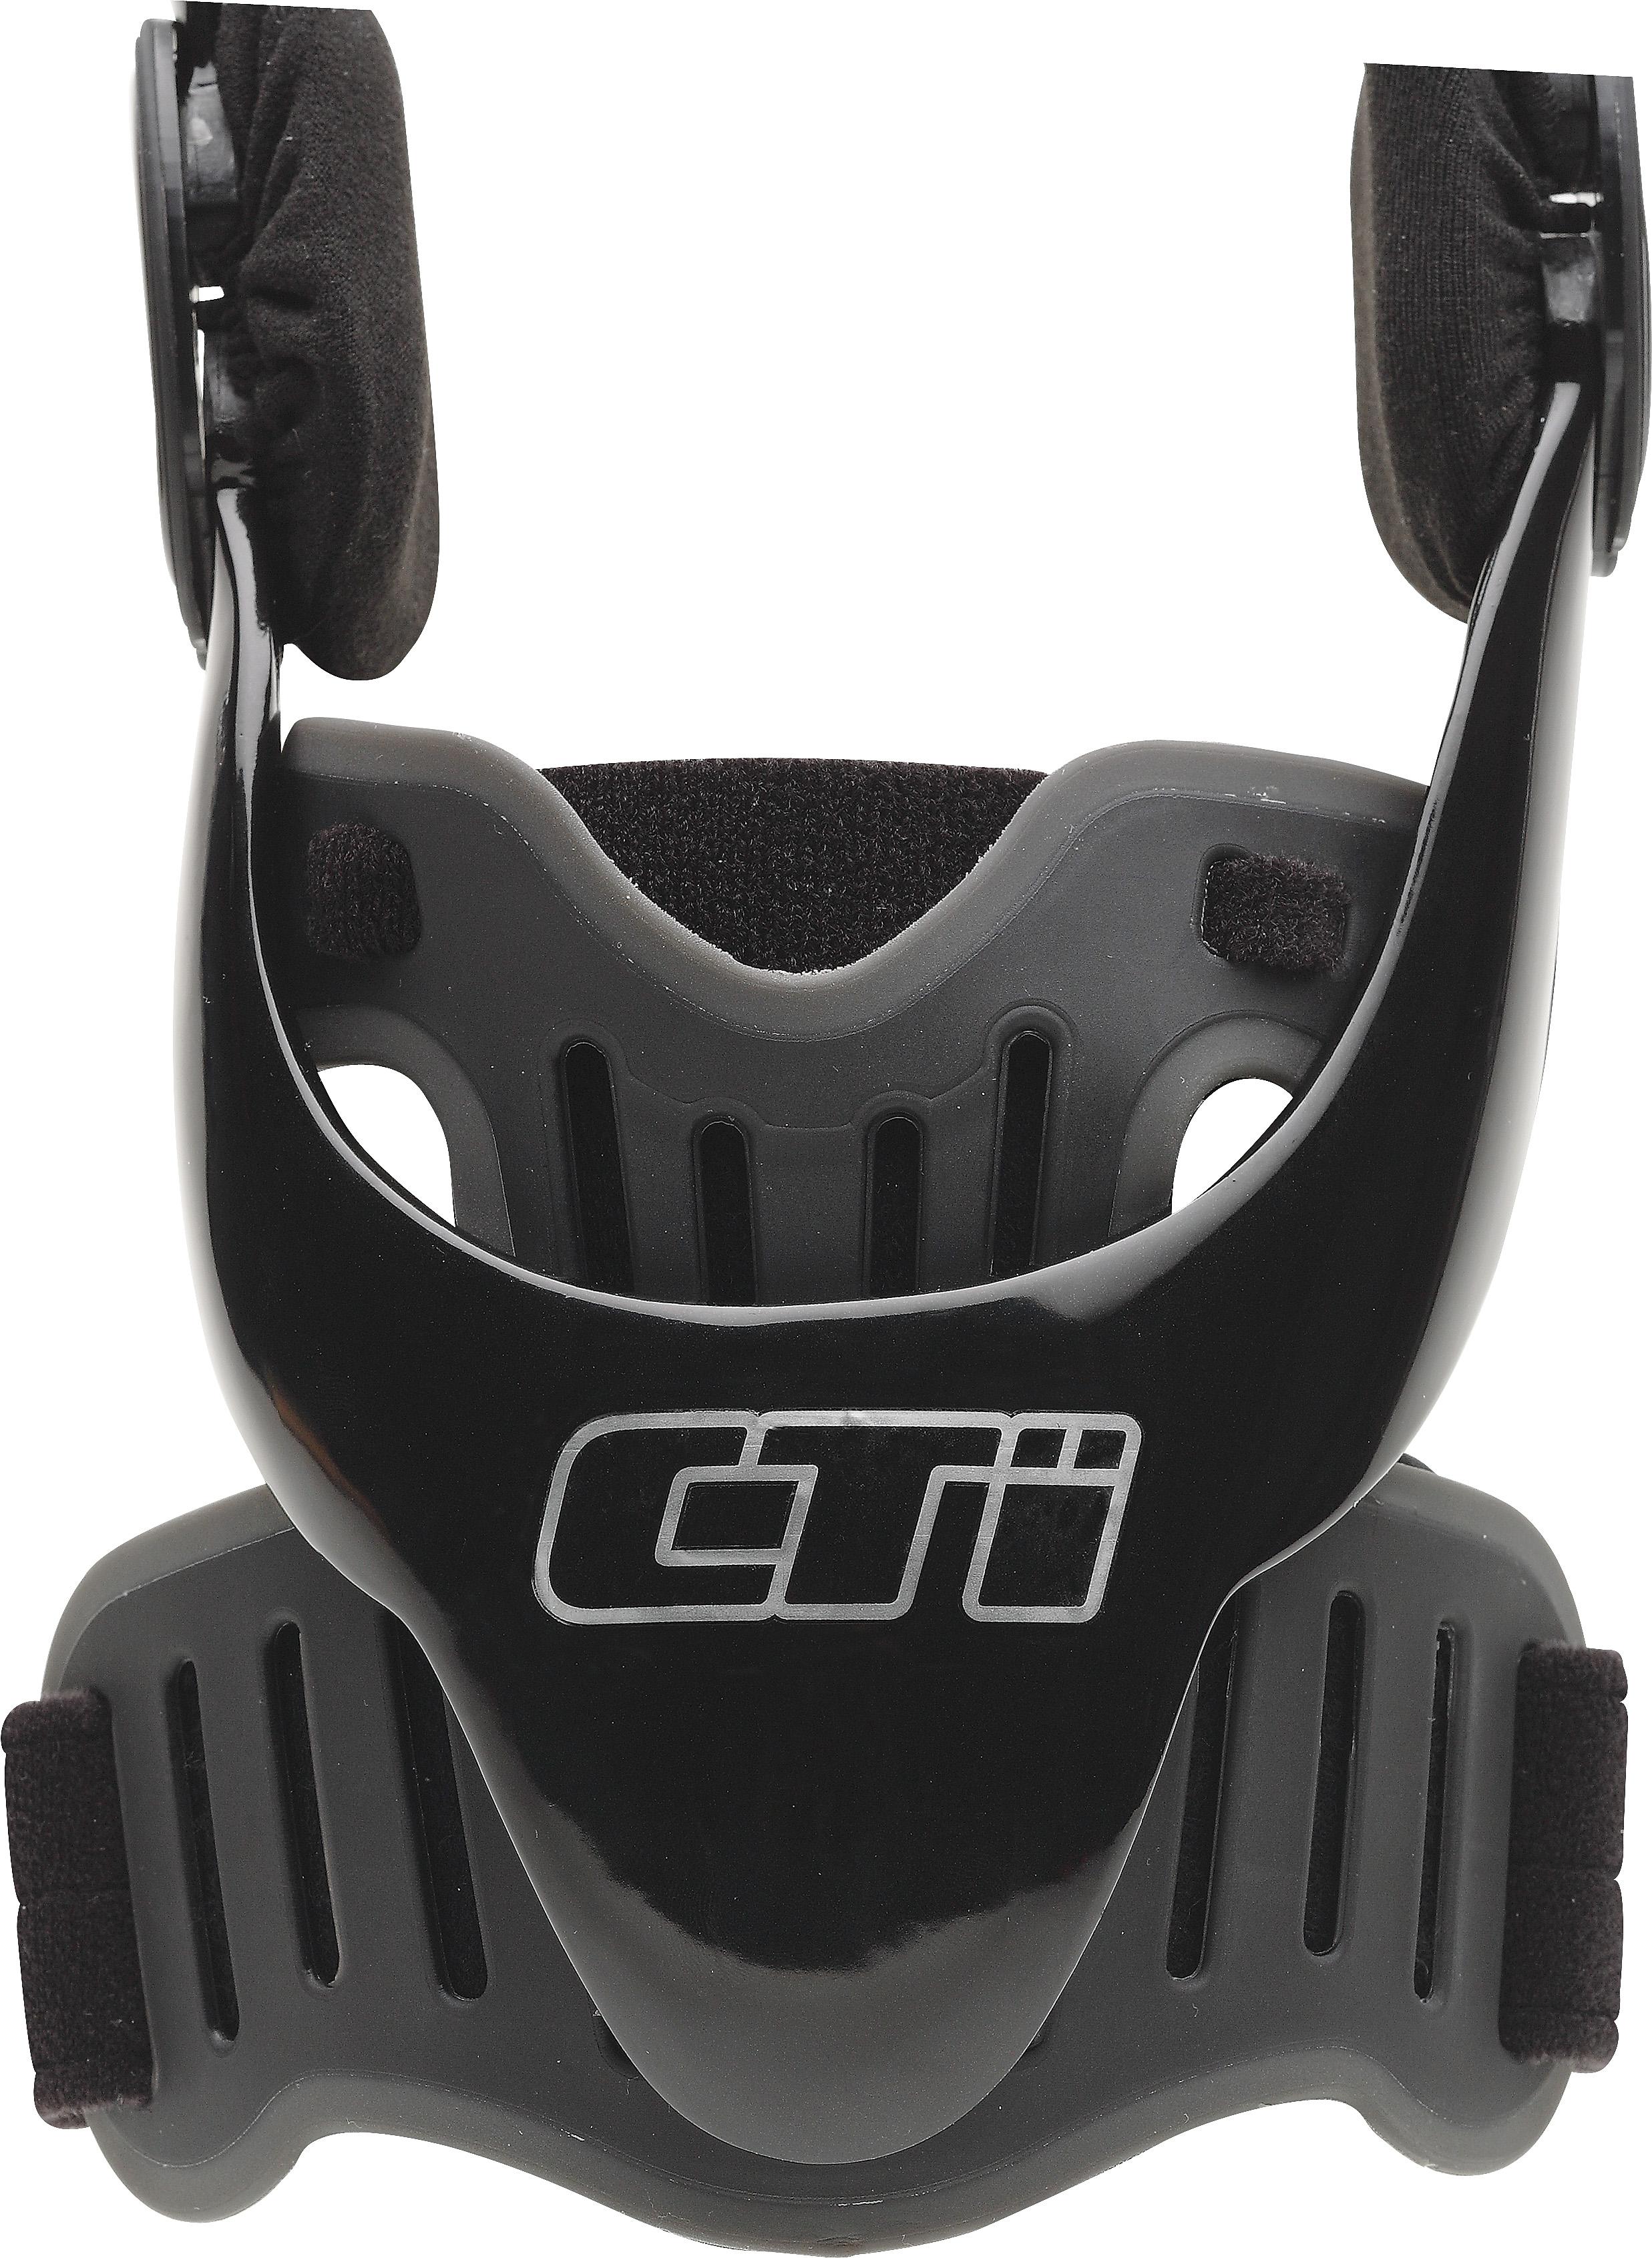 cti-ots-pcl-left-small-b-238640112-ossur-os377928-7.jpg